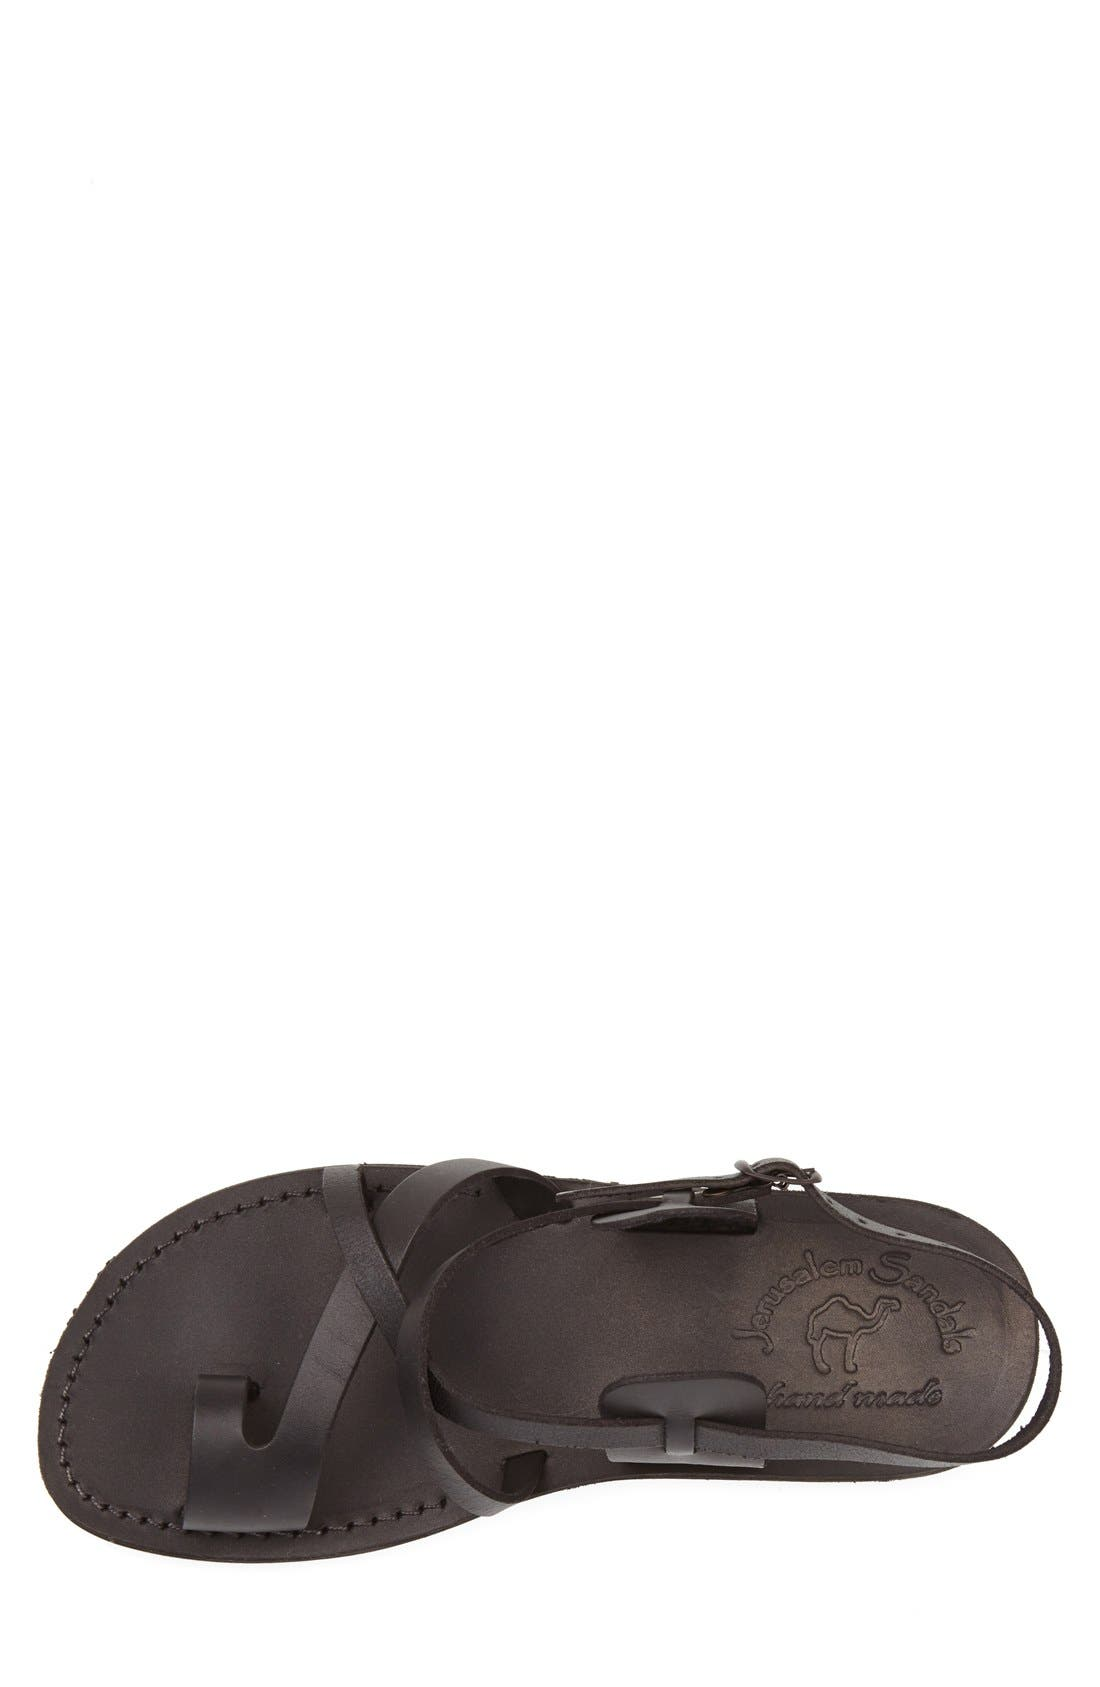 'The Good Shepherd' Leather Sandal,                             Alternate thumbnail 2, color,                             BLACK